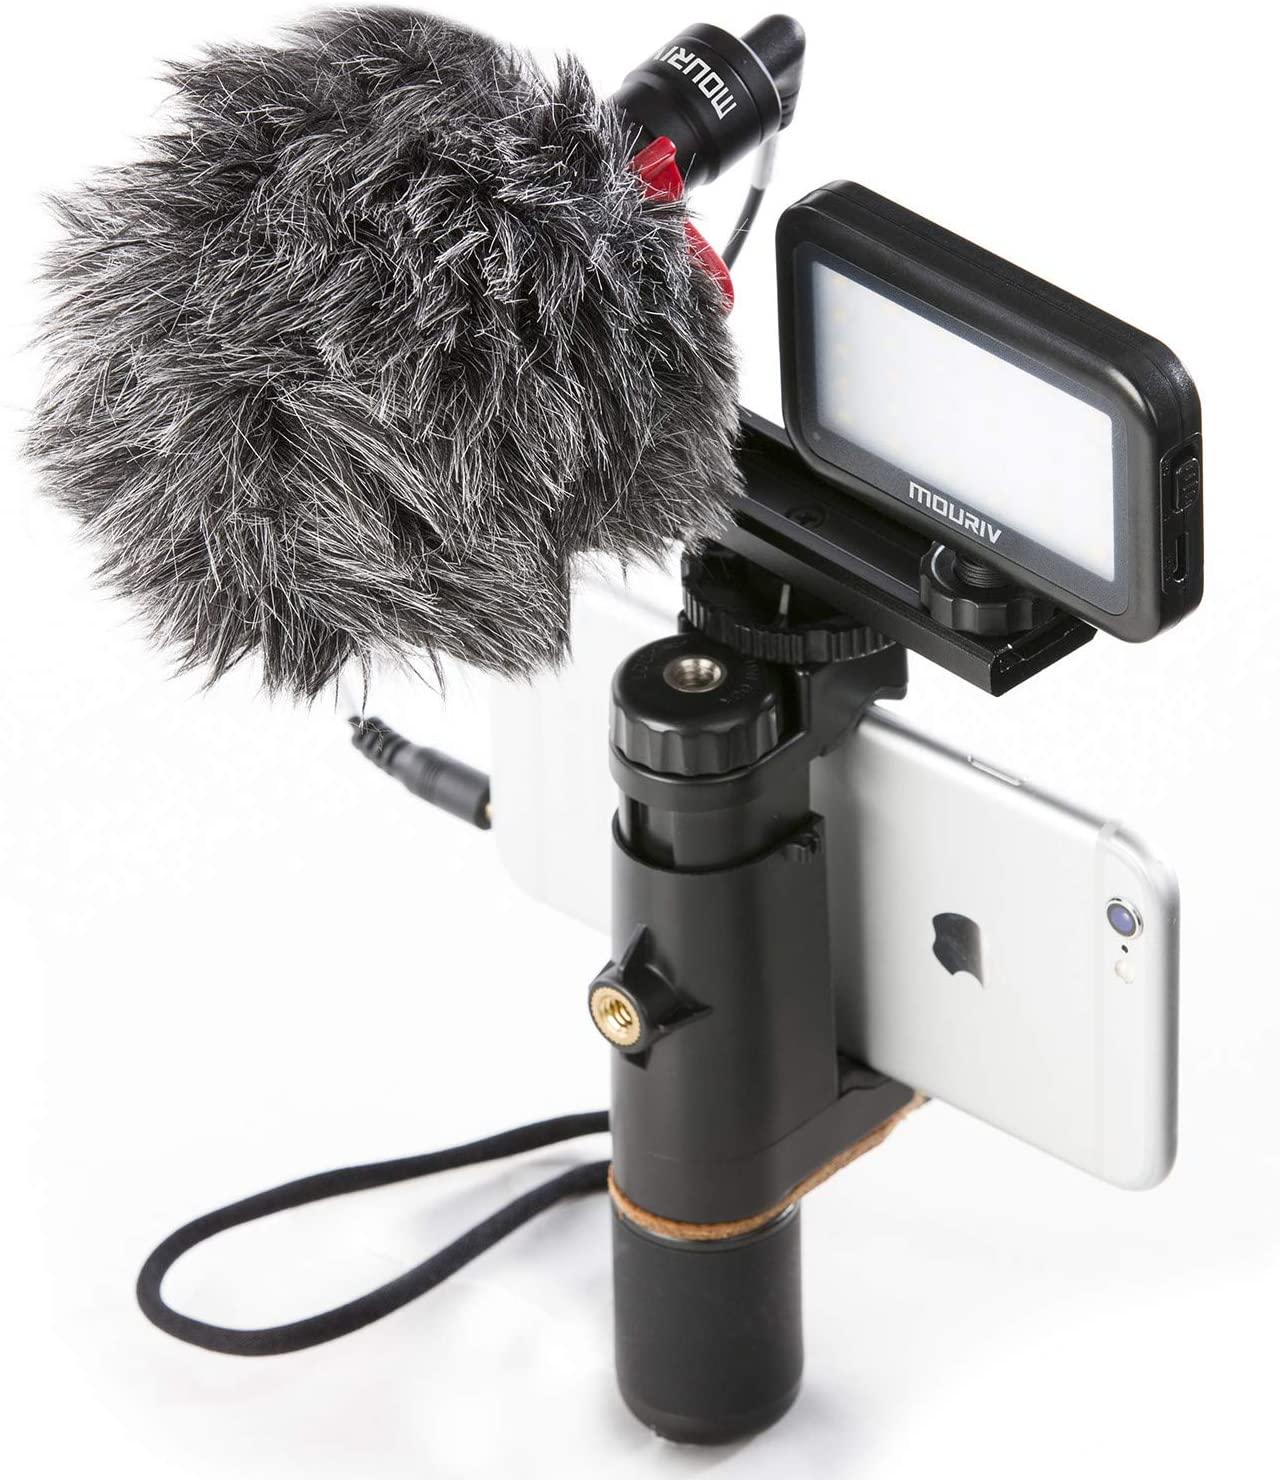 Mouriv vlogging kit amazon